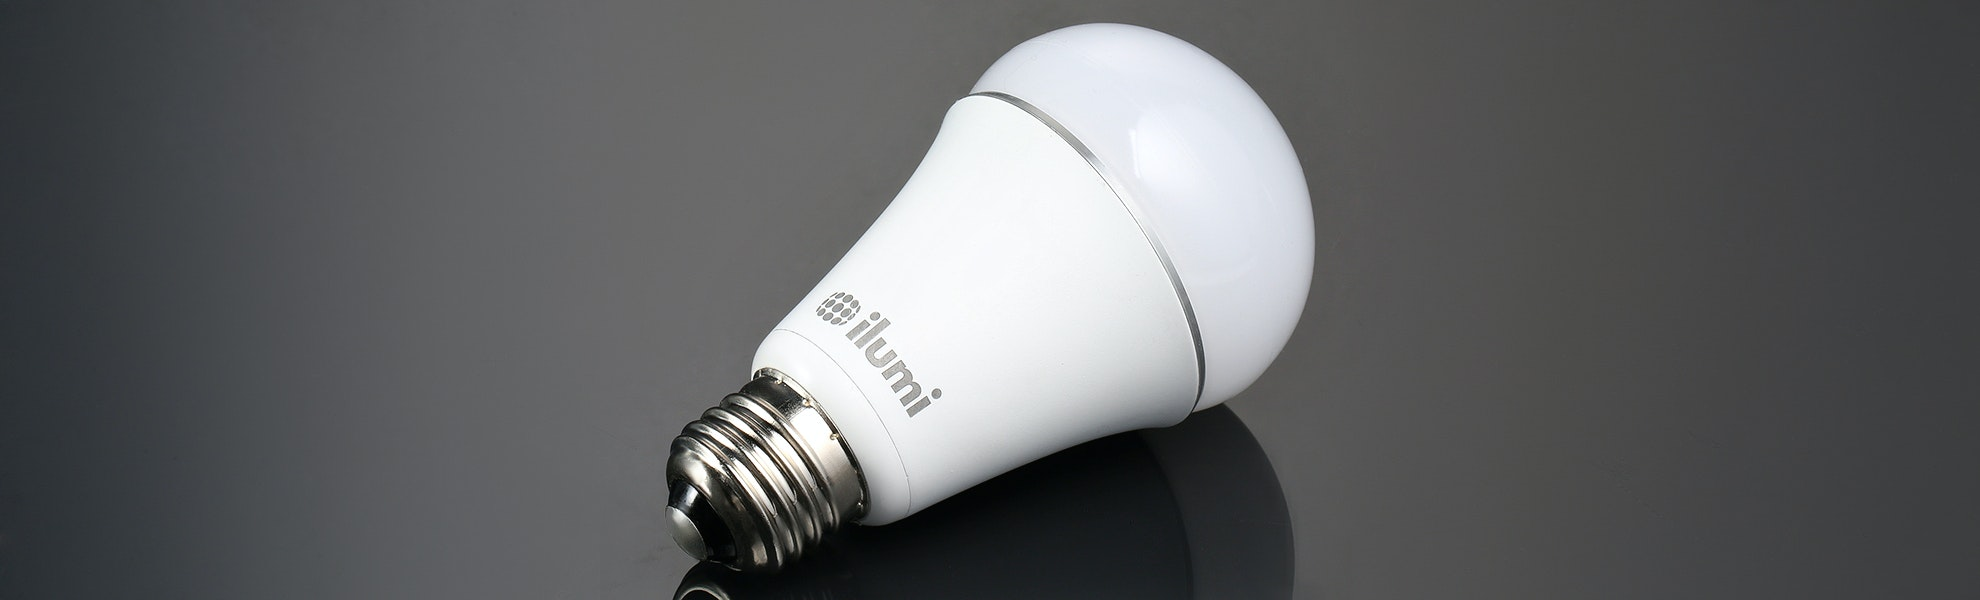 Ilumi A19 Smart LED Light Bulb